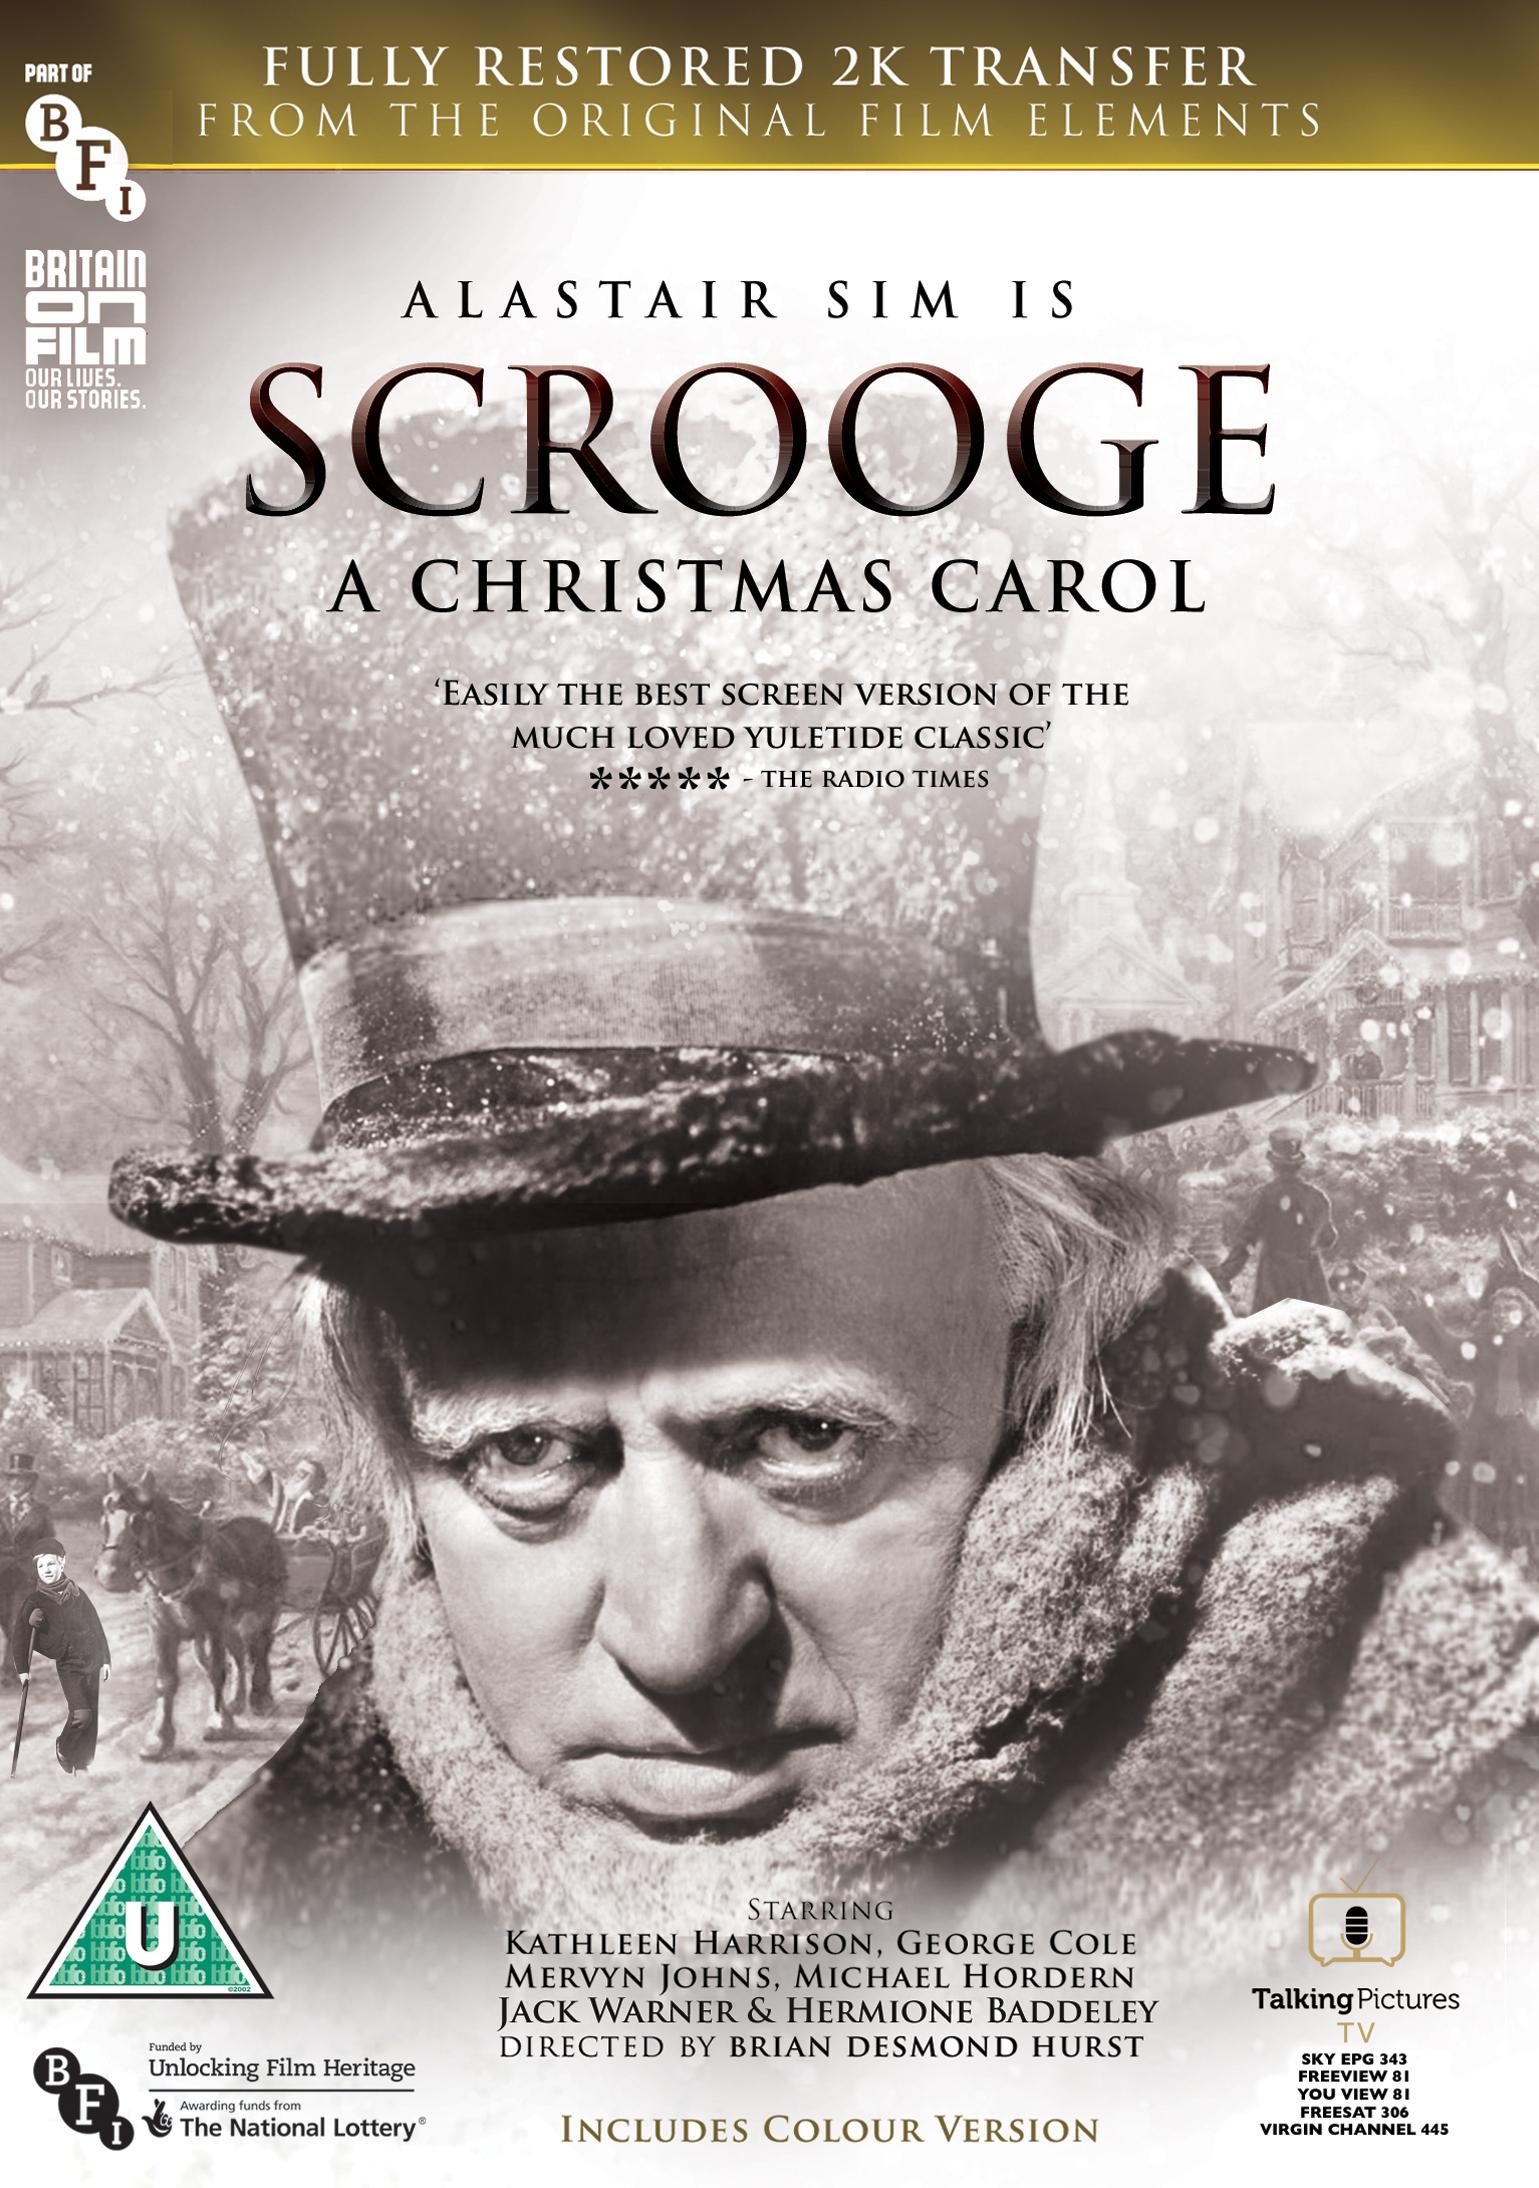 Original Christmas Carol Movie.Scrooge A Christmas Carol Fully Restored 2k Edition